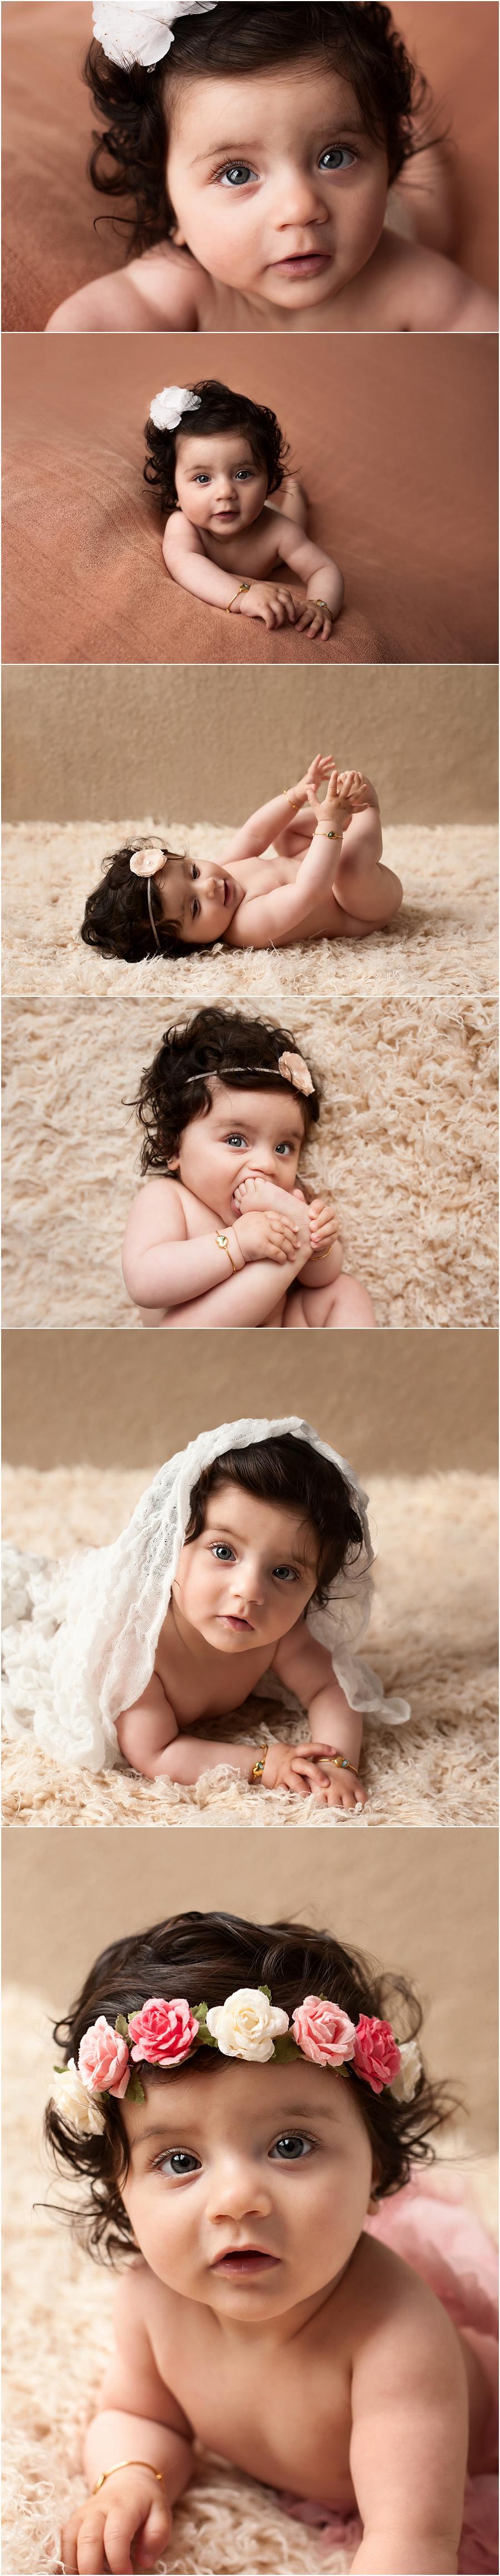 Feid 7 maanden - Baby fotoshoot Arnhem